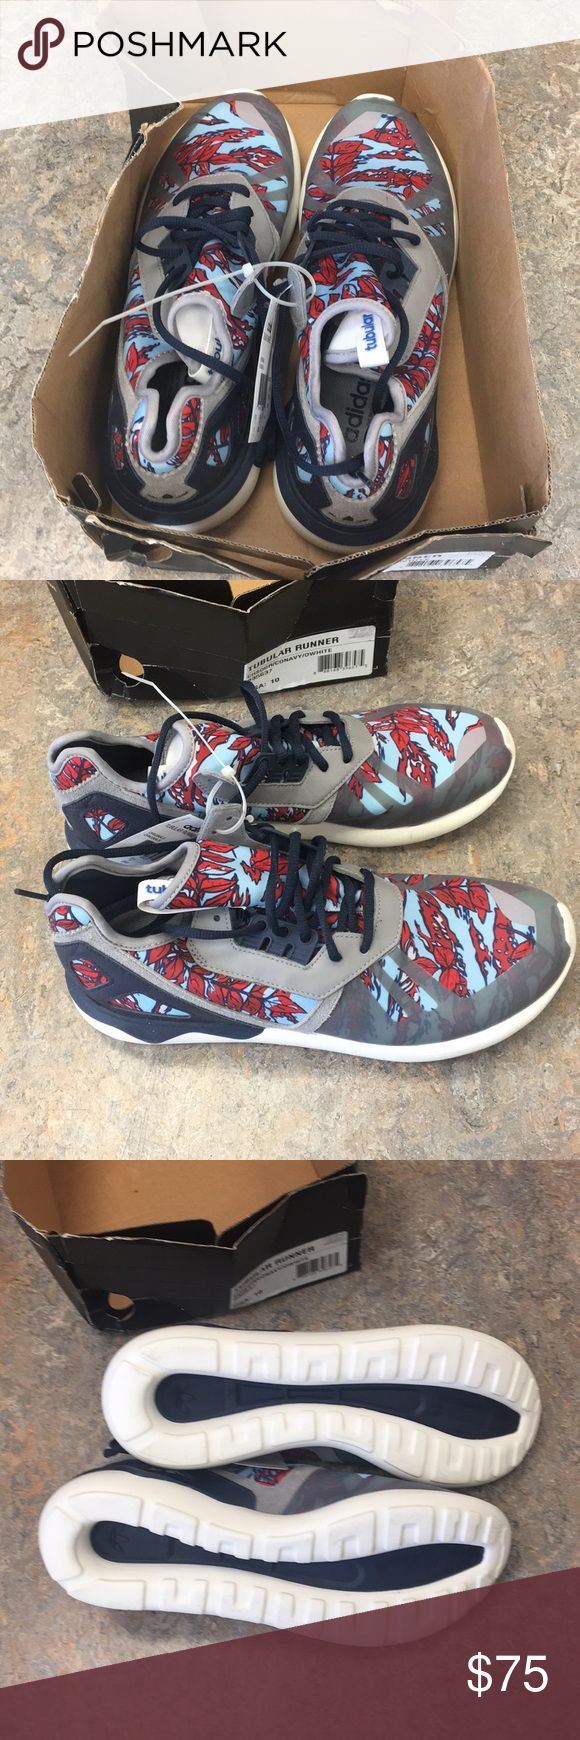 Adidas Tubular Runner Men's Shoes Size 10 Brand new with box (top torn off) Adidas Tubular runner shoes size 10. adidas Shoes Athletic Shoes http://feedproxy.google.com/fashionshoes11